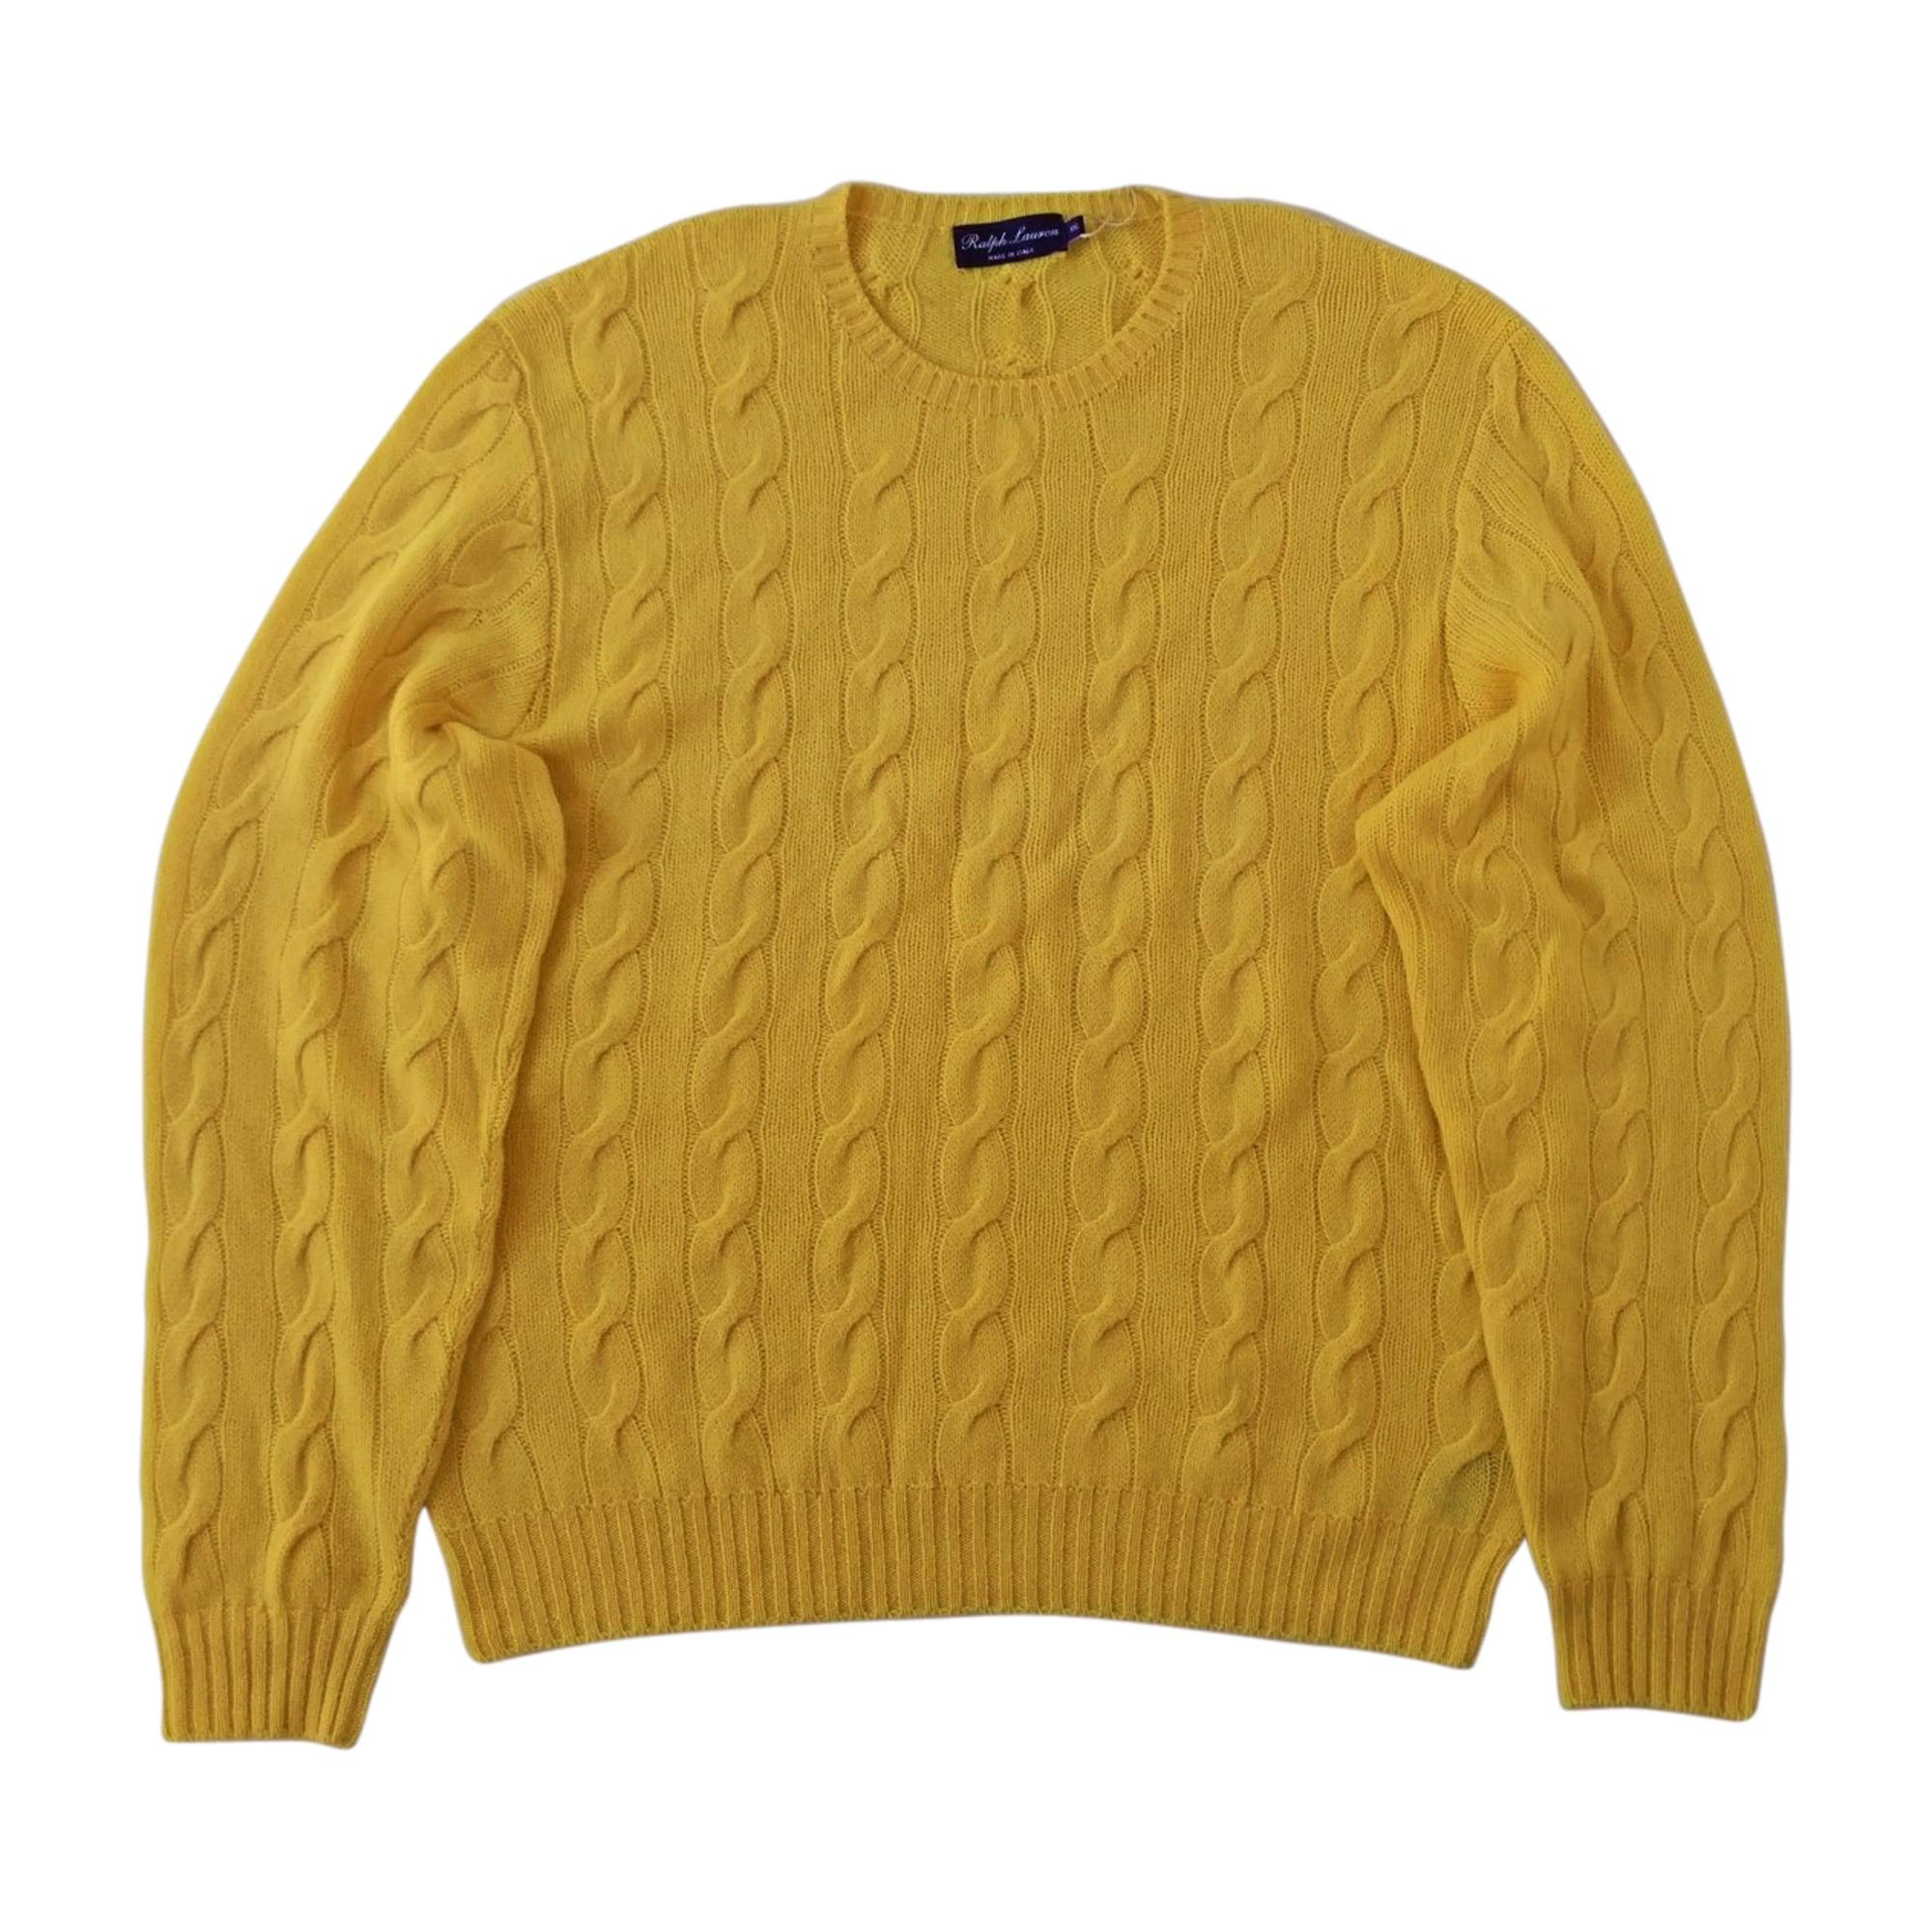 Pull RALPH LAUREN 5 (XXL) jaune - 7816125 68ba90379b3